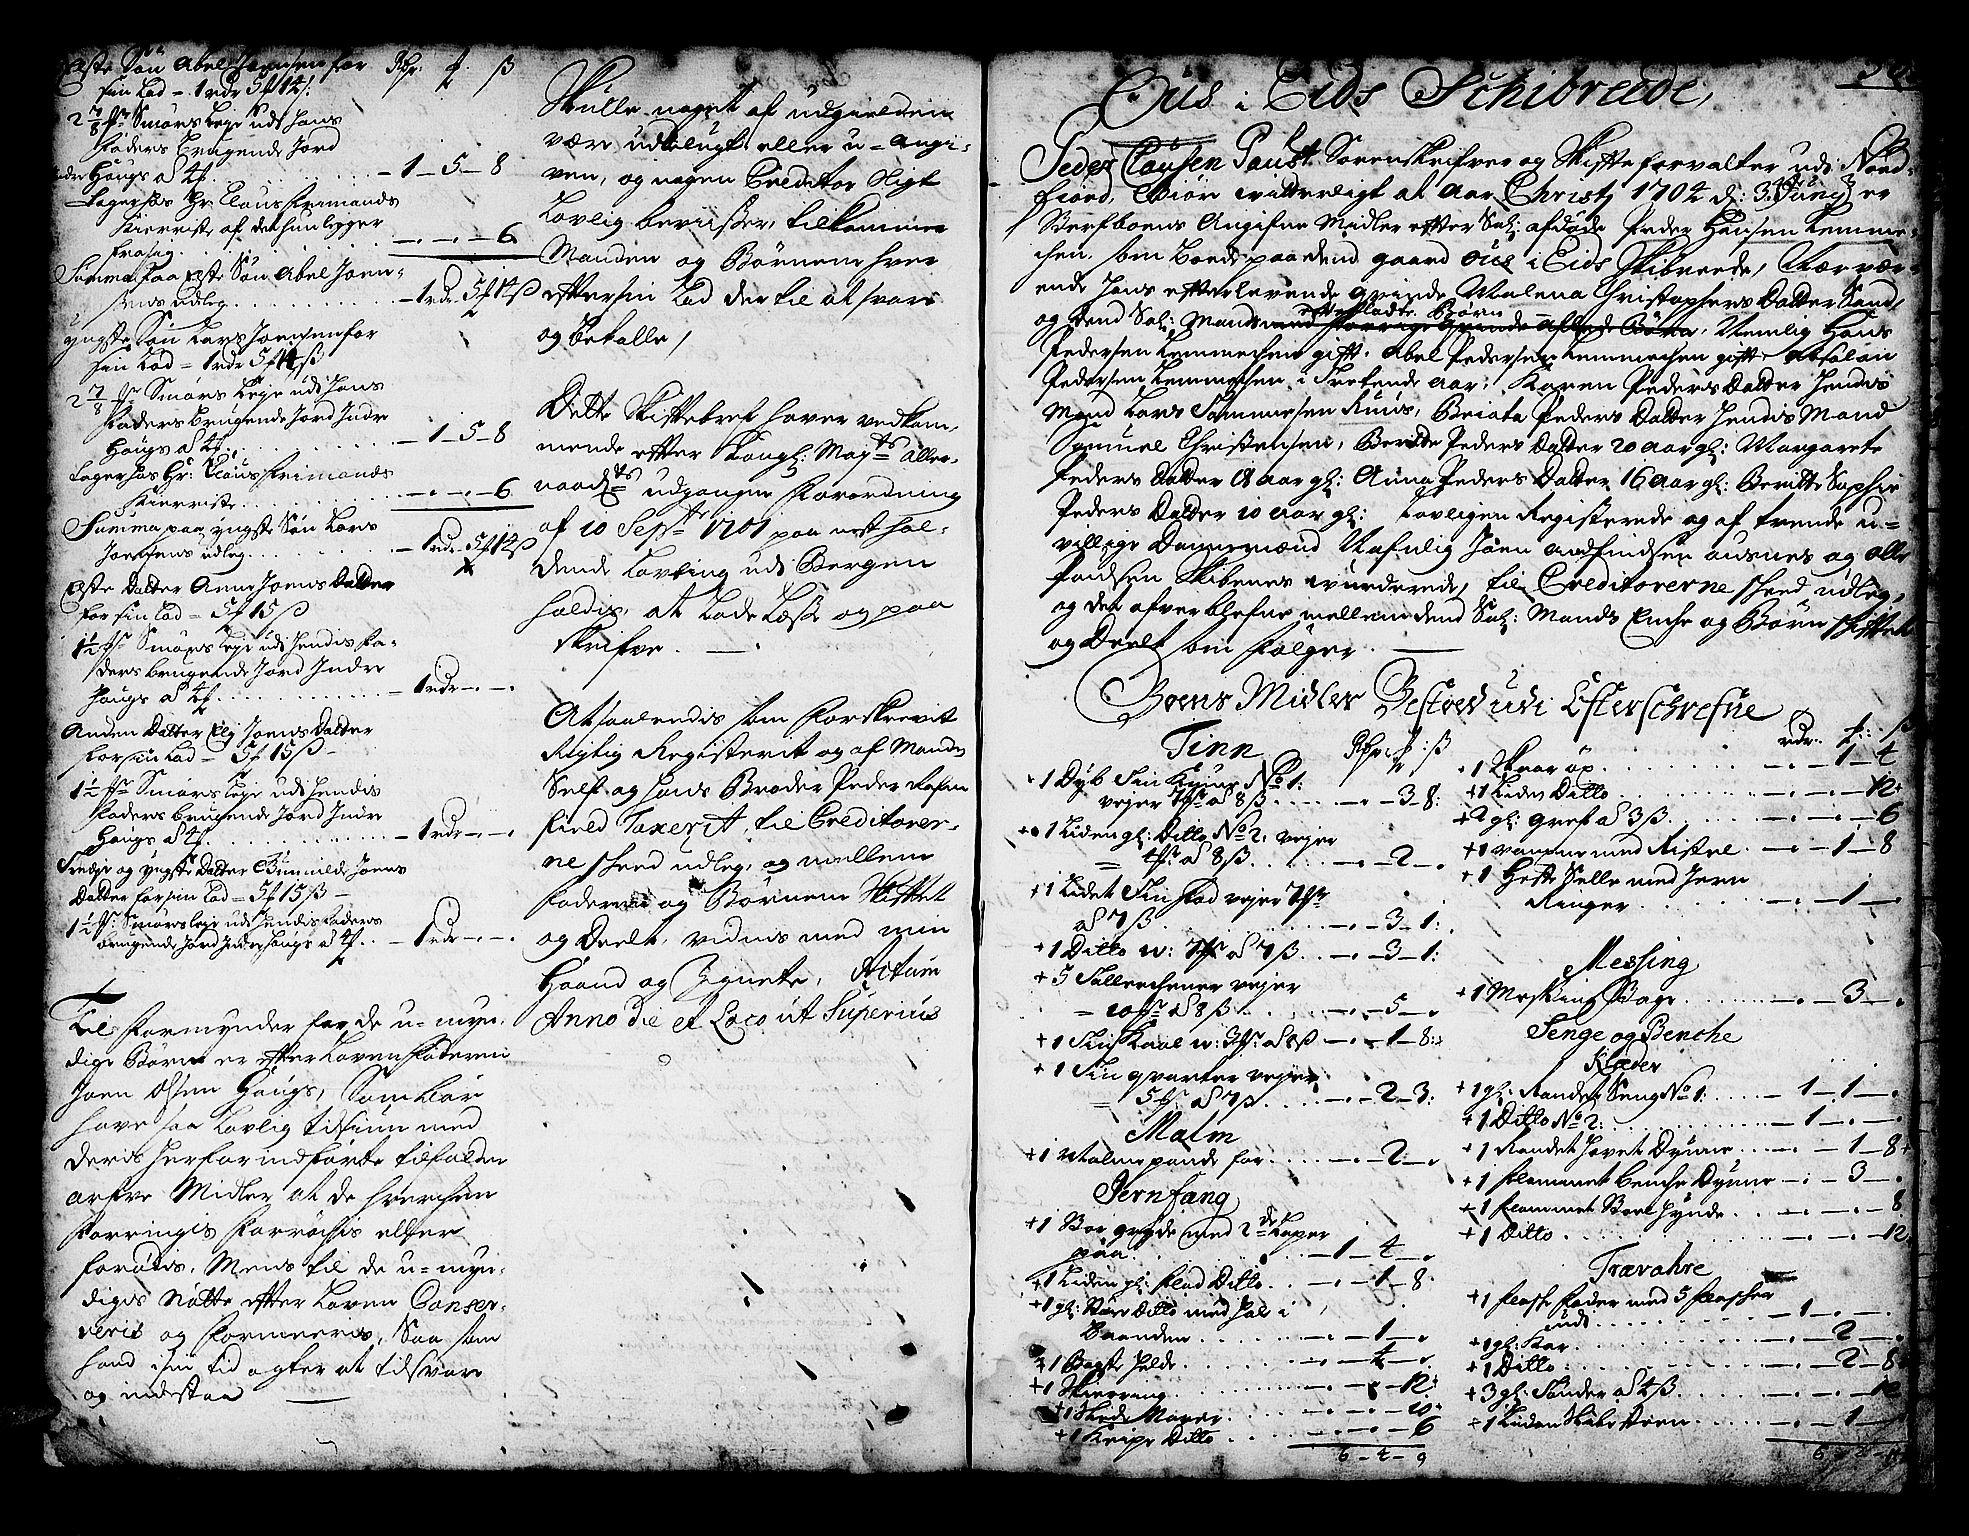 SAB, Nordfjord sorenskriveri, 04/04a/L0002b: Skifteprotokollar, 1702-1704, p. 366b-367a